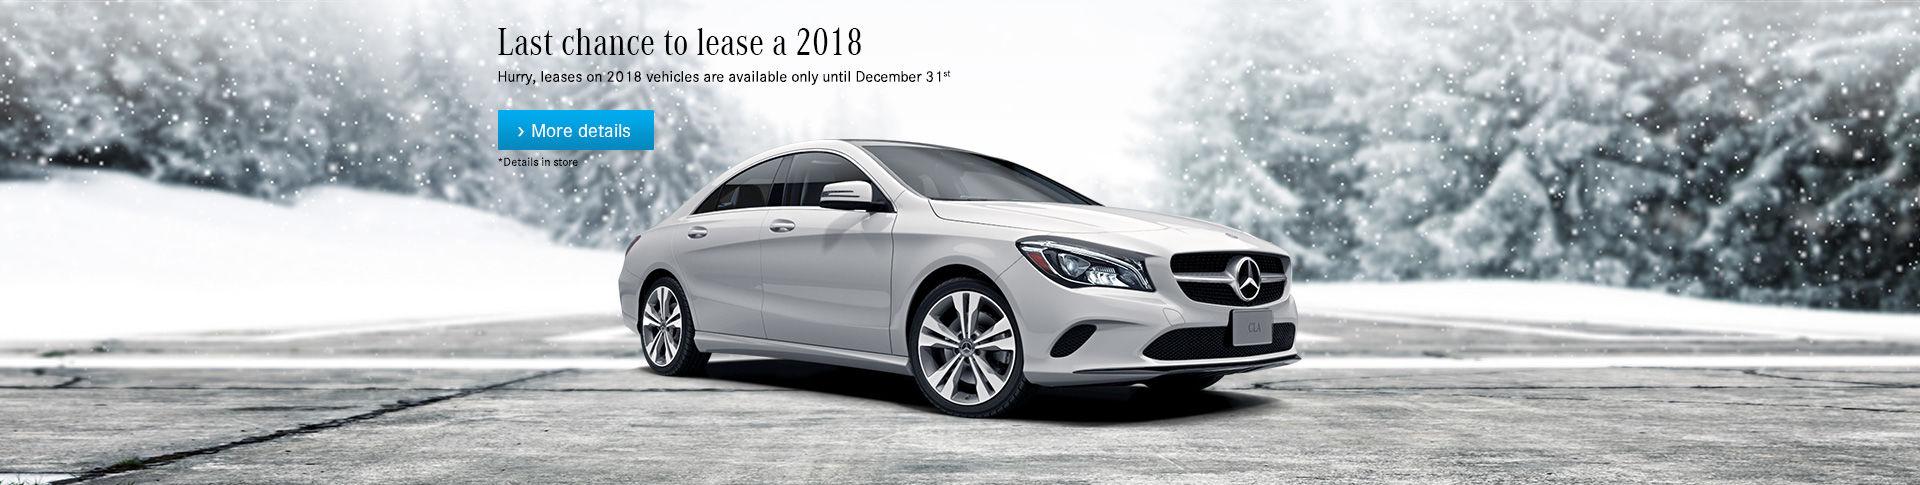 2018 Vehicle Lease